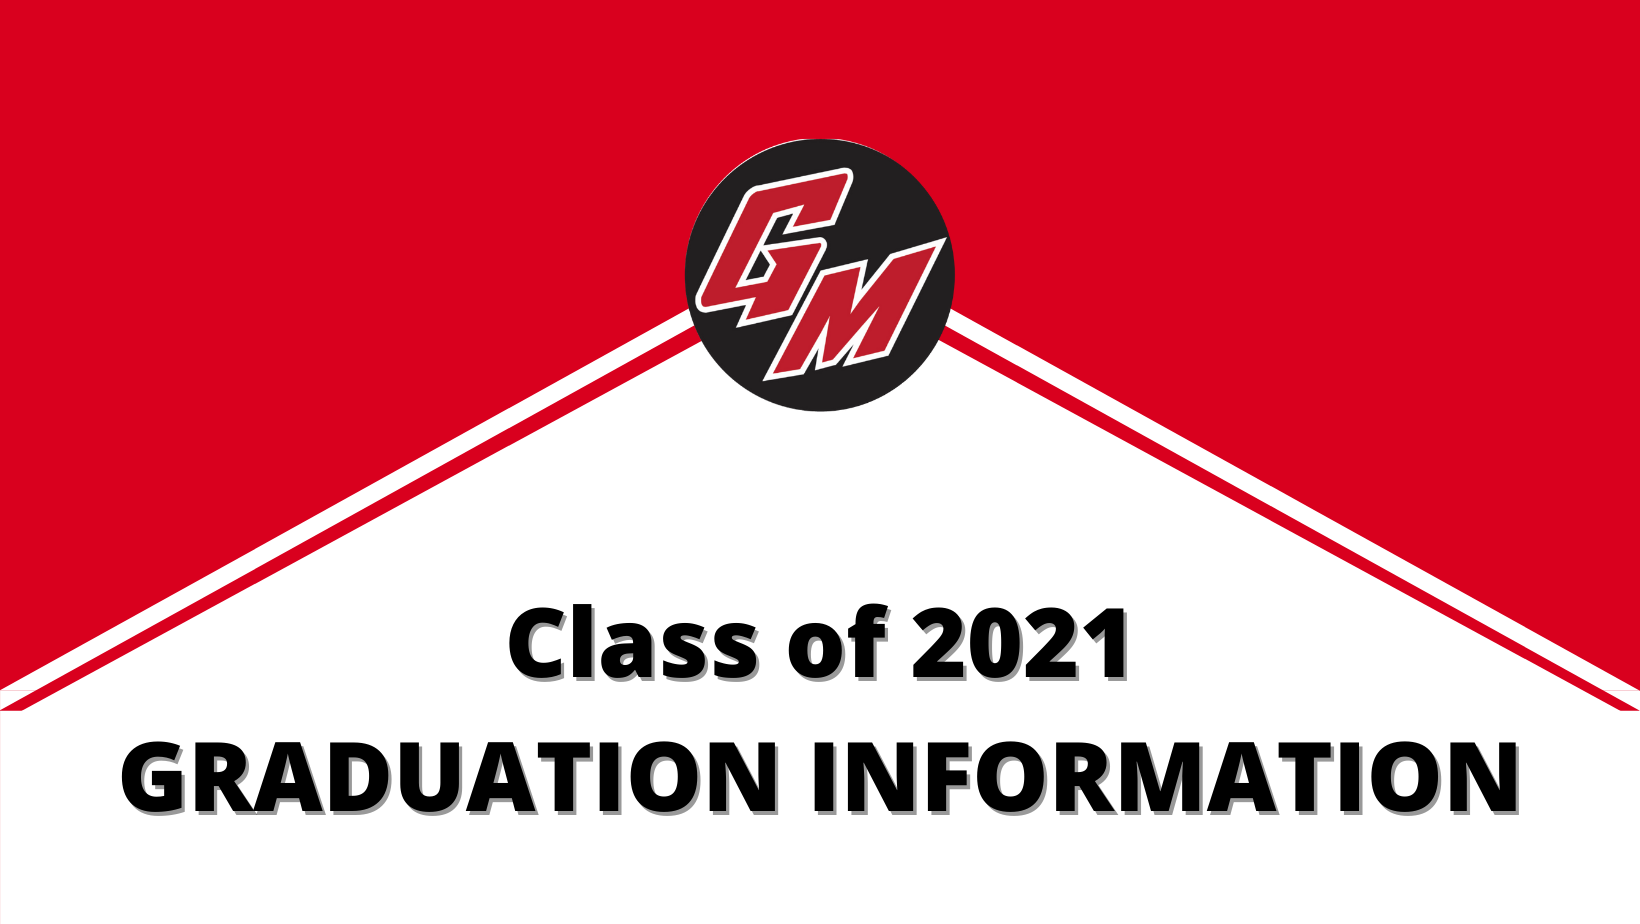 Class or 2021 Graduation Information